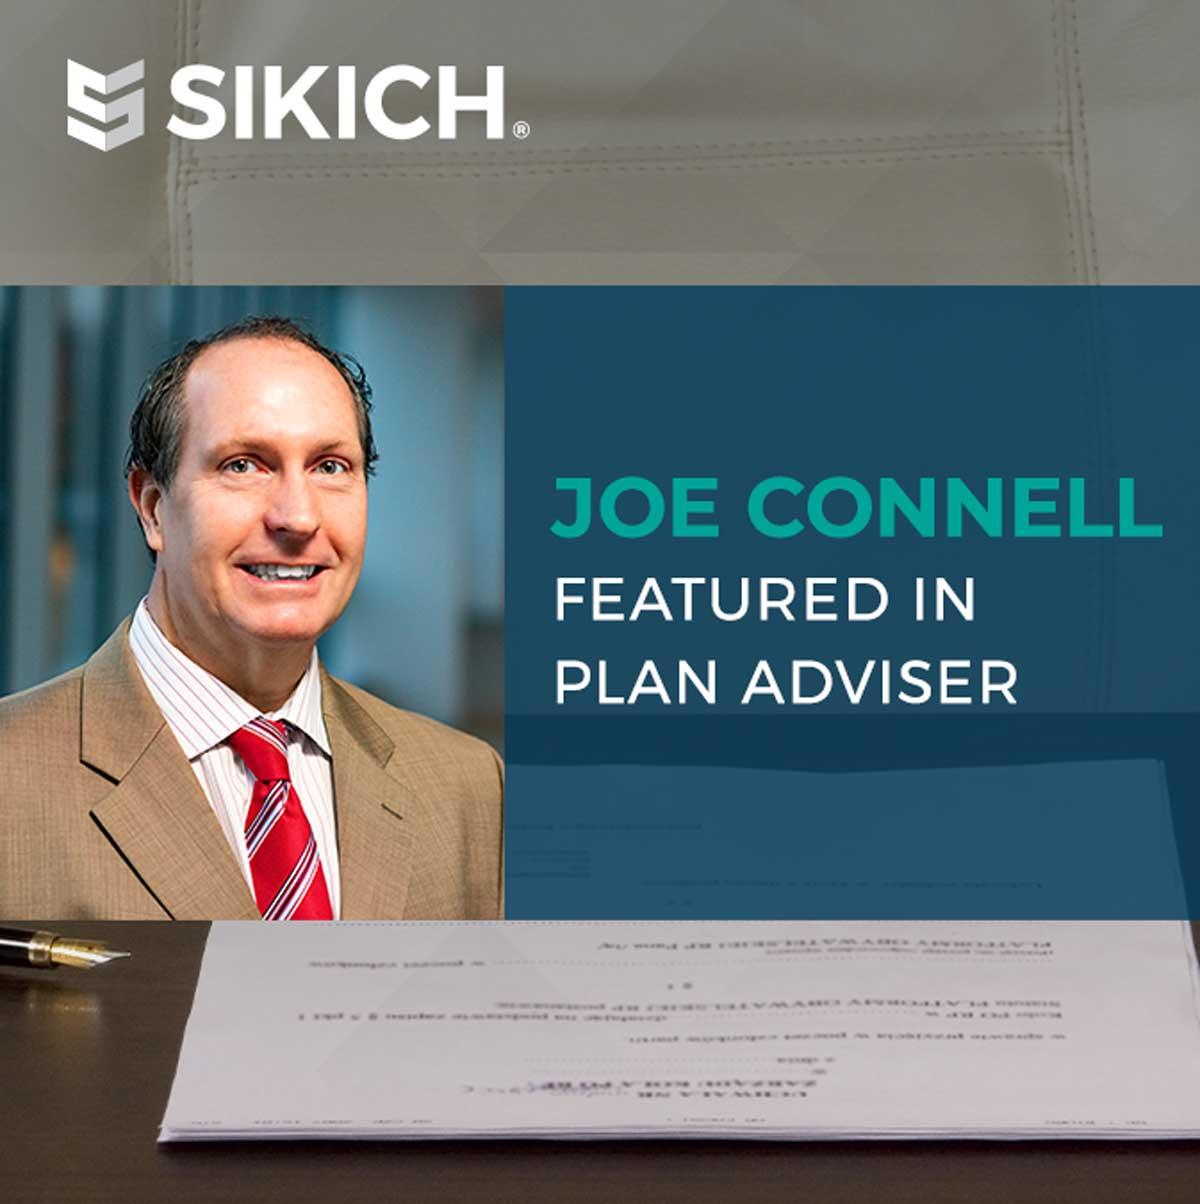 Plan-Adviser-Features-Joe-Connell